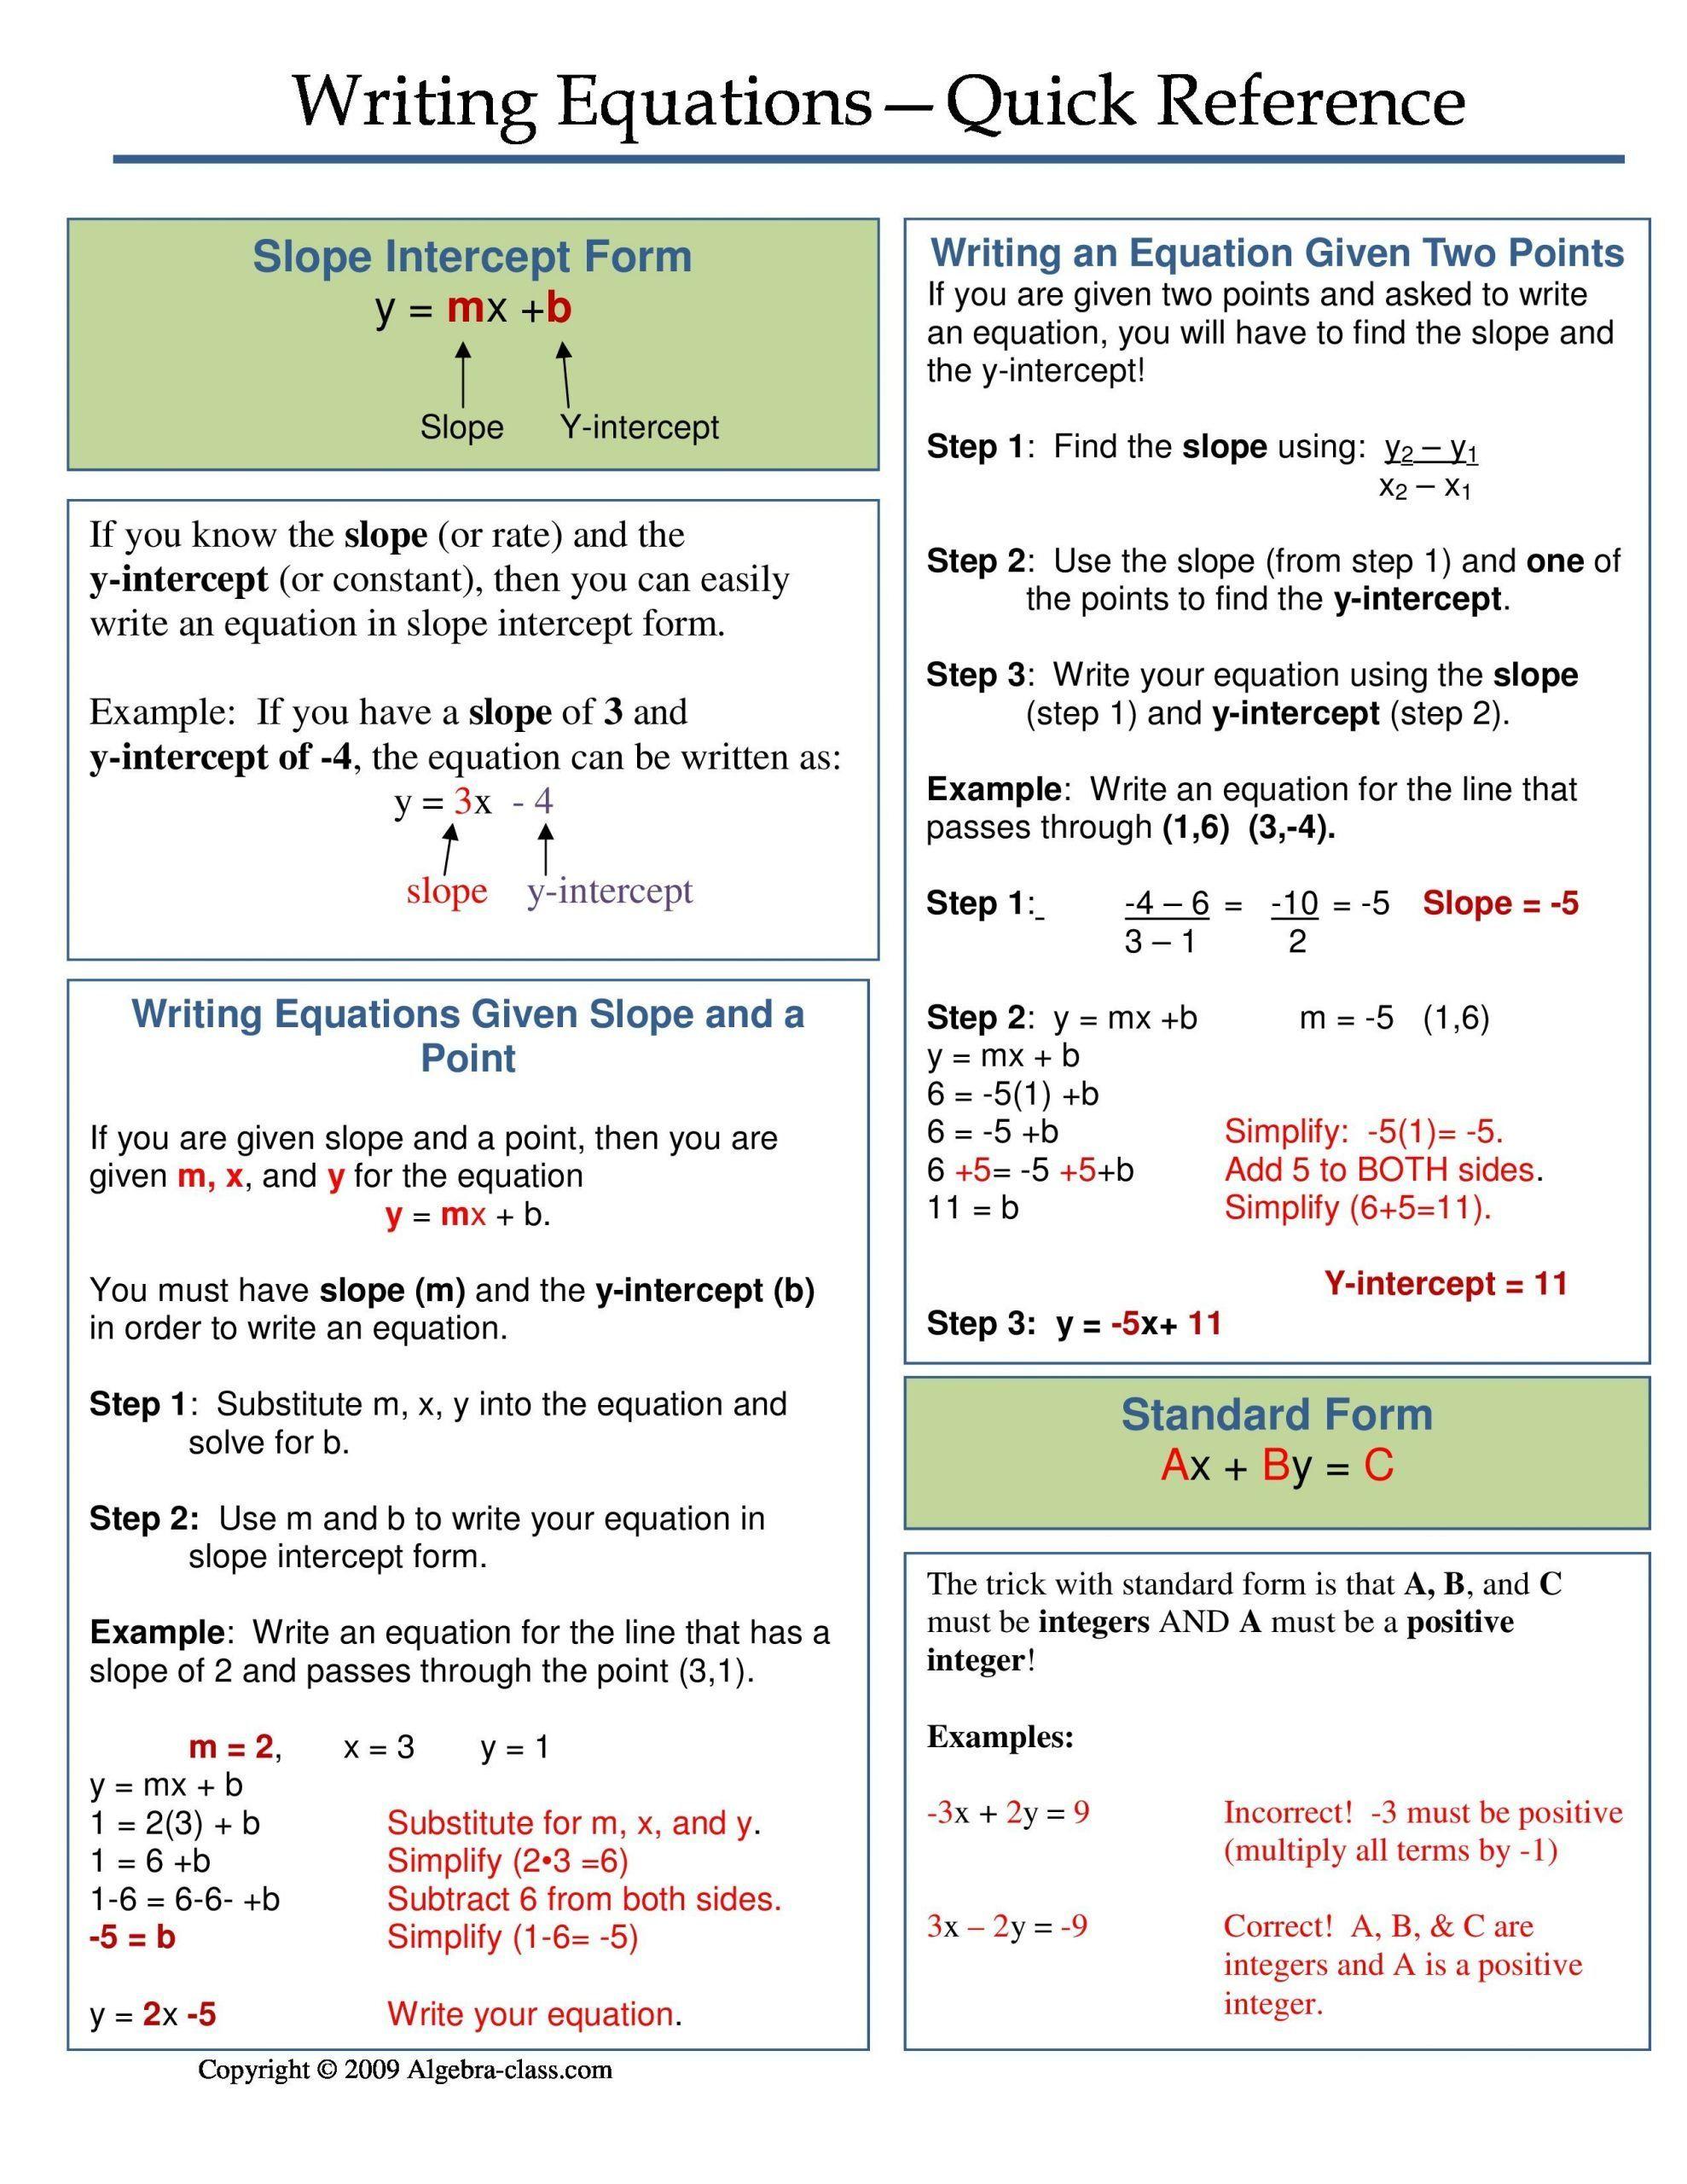 Writing A Function Rule Worksheet E Page Notes Worksheet For Writing Equations Unit In 2020 Writing Equations Teaching Algebra Teaching Math